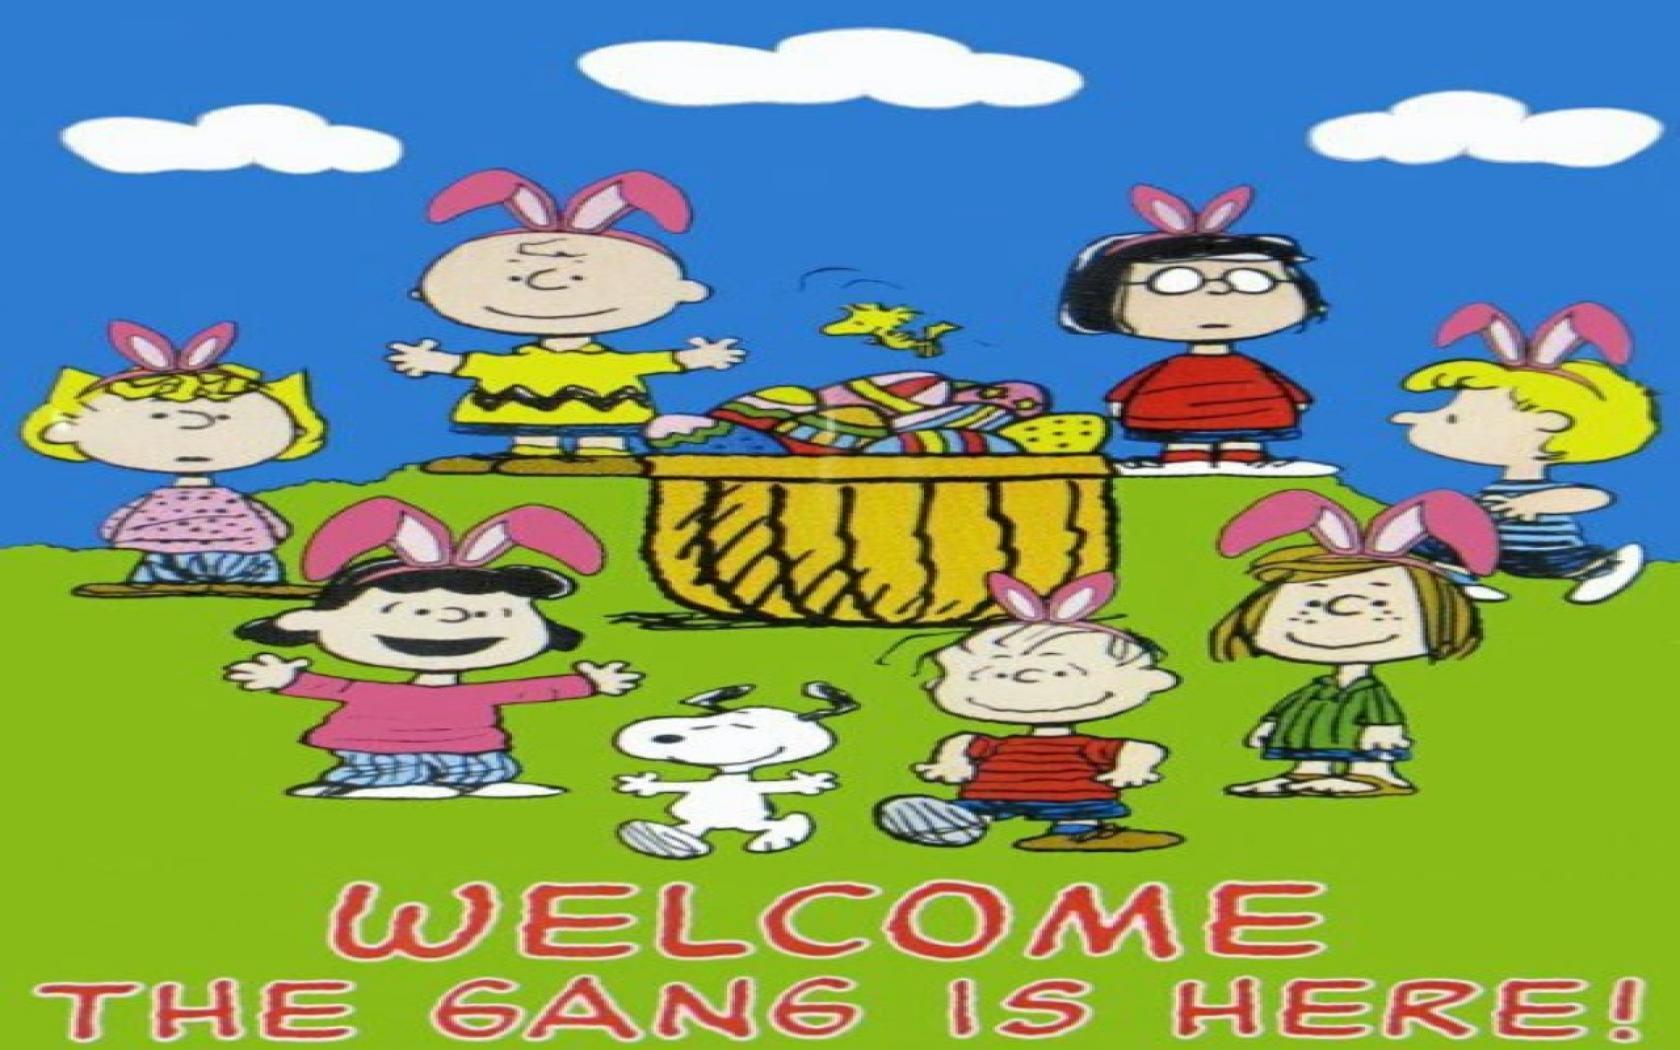 im789 Charlie Brown Easter Wallpaper 1680x1050   Picseriocom 1680x1050